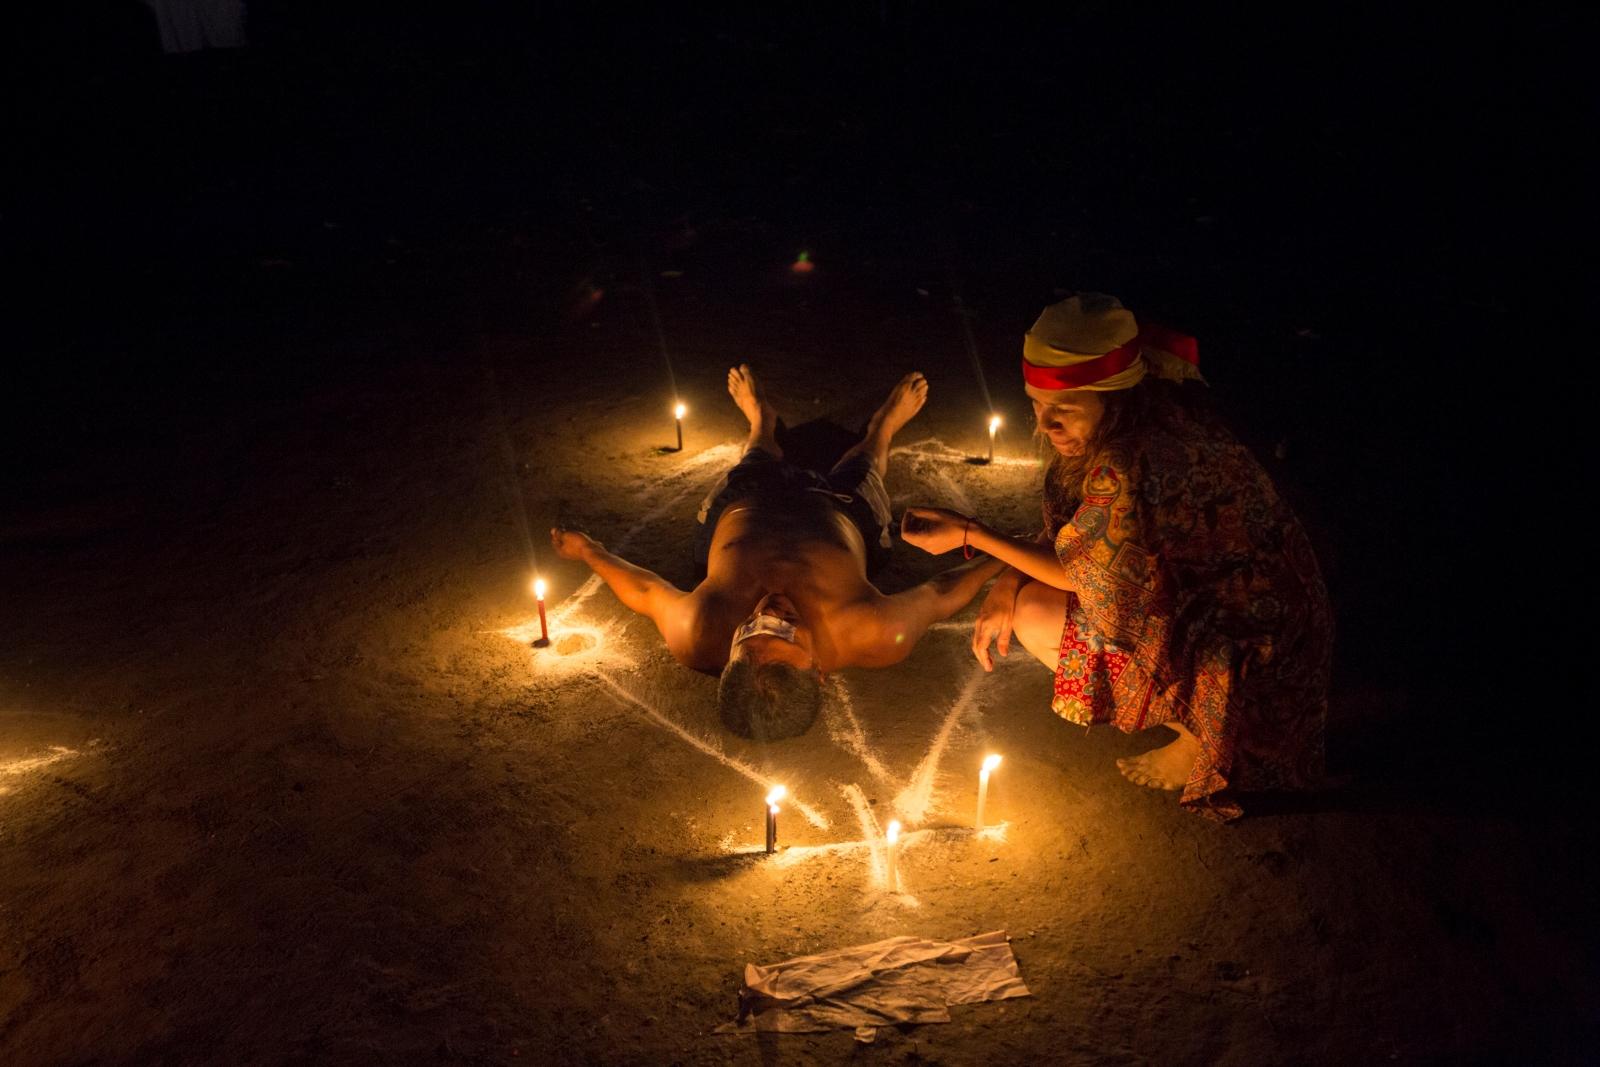 A Santeria ritual performed in Venenzuala